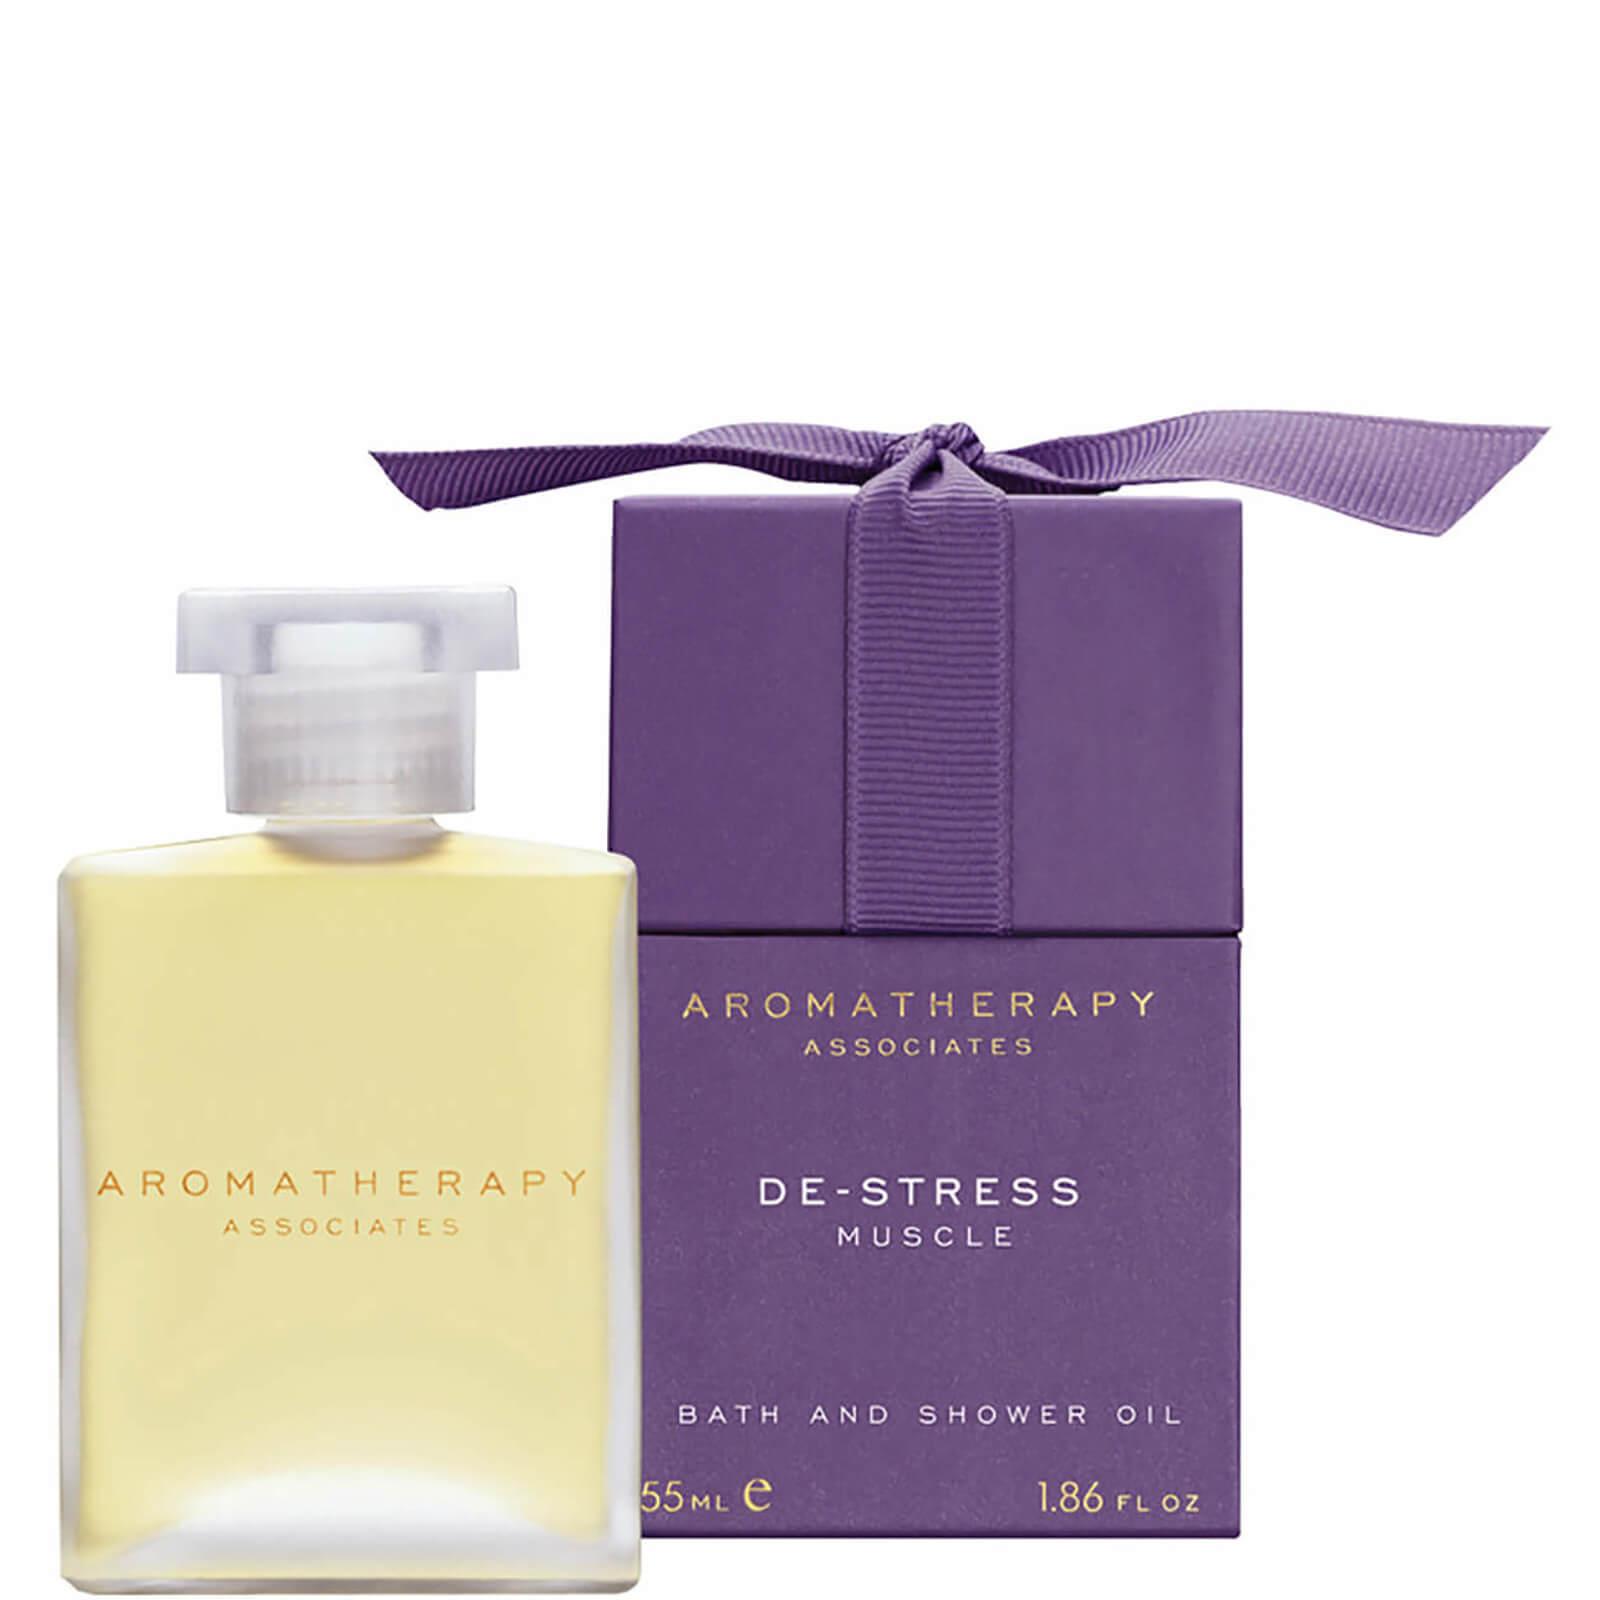 Look Fantastic coupon: Aromatherapy Associates De-Stress Muscle Bath & Shower Oil (55ml)